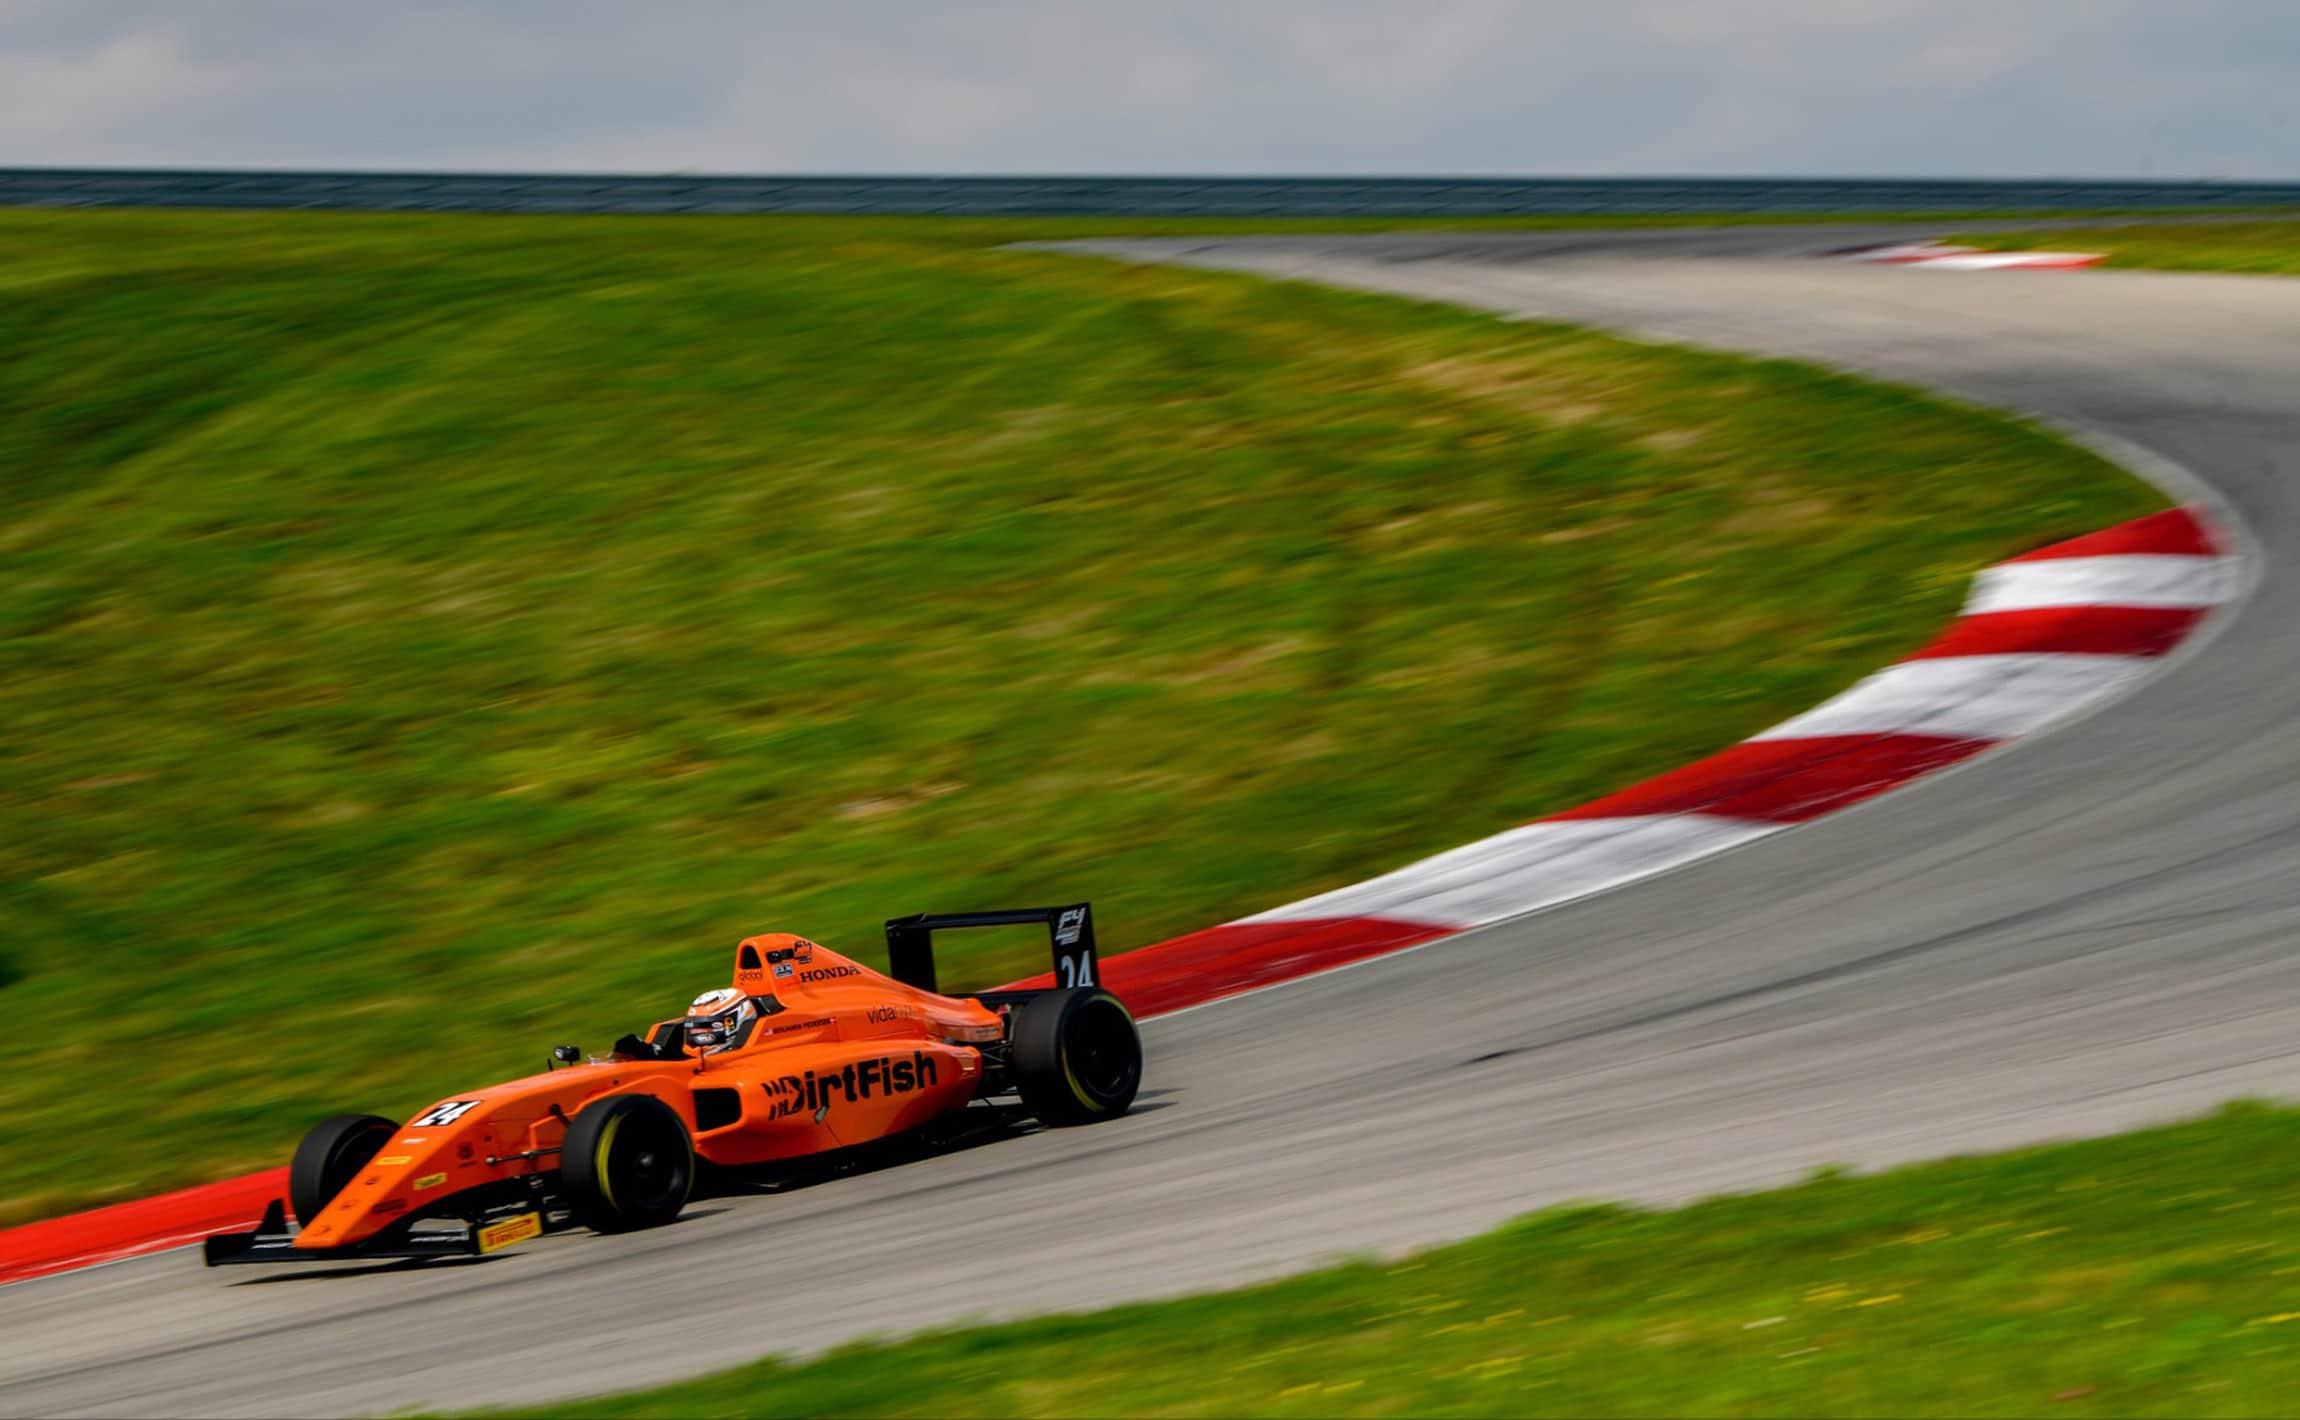 Benjamin Pedersen F4 At Pittsburgh International Race